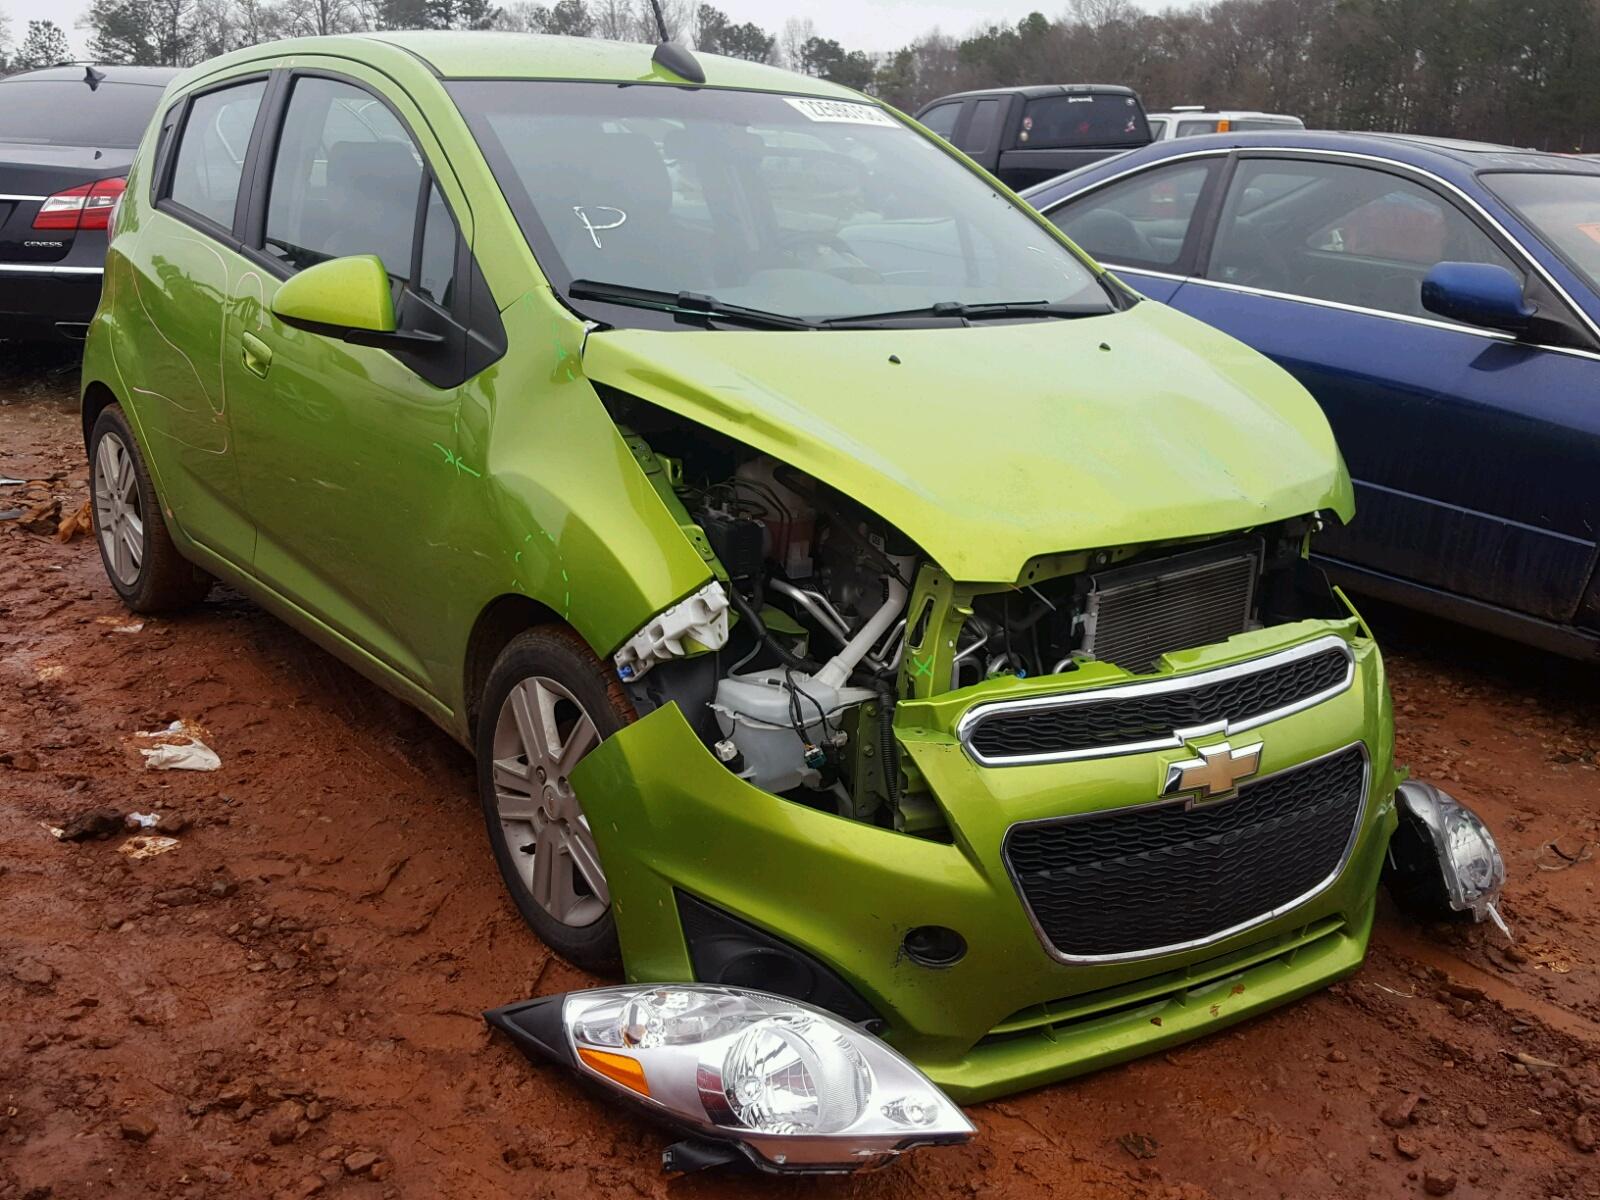 door dp chevrolet specs and reviews vehicles amazon spark images hatchback ls com